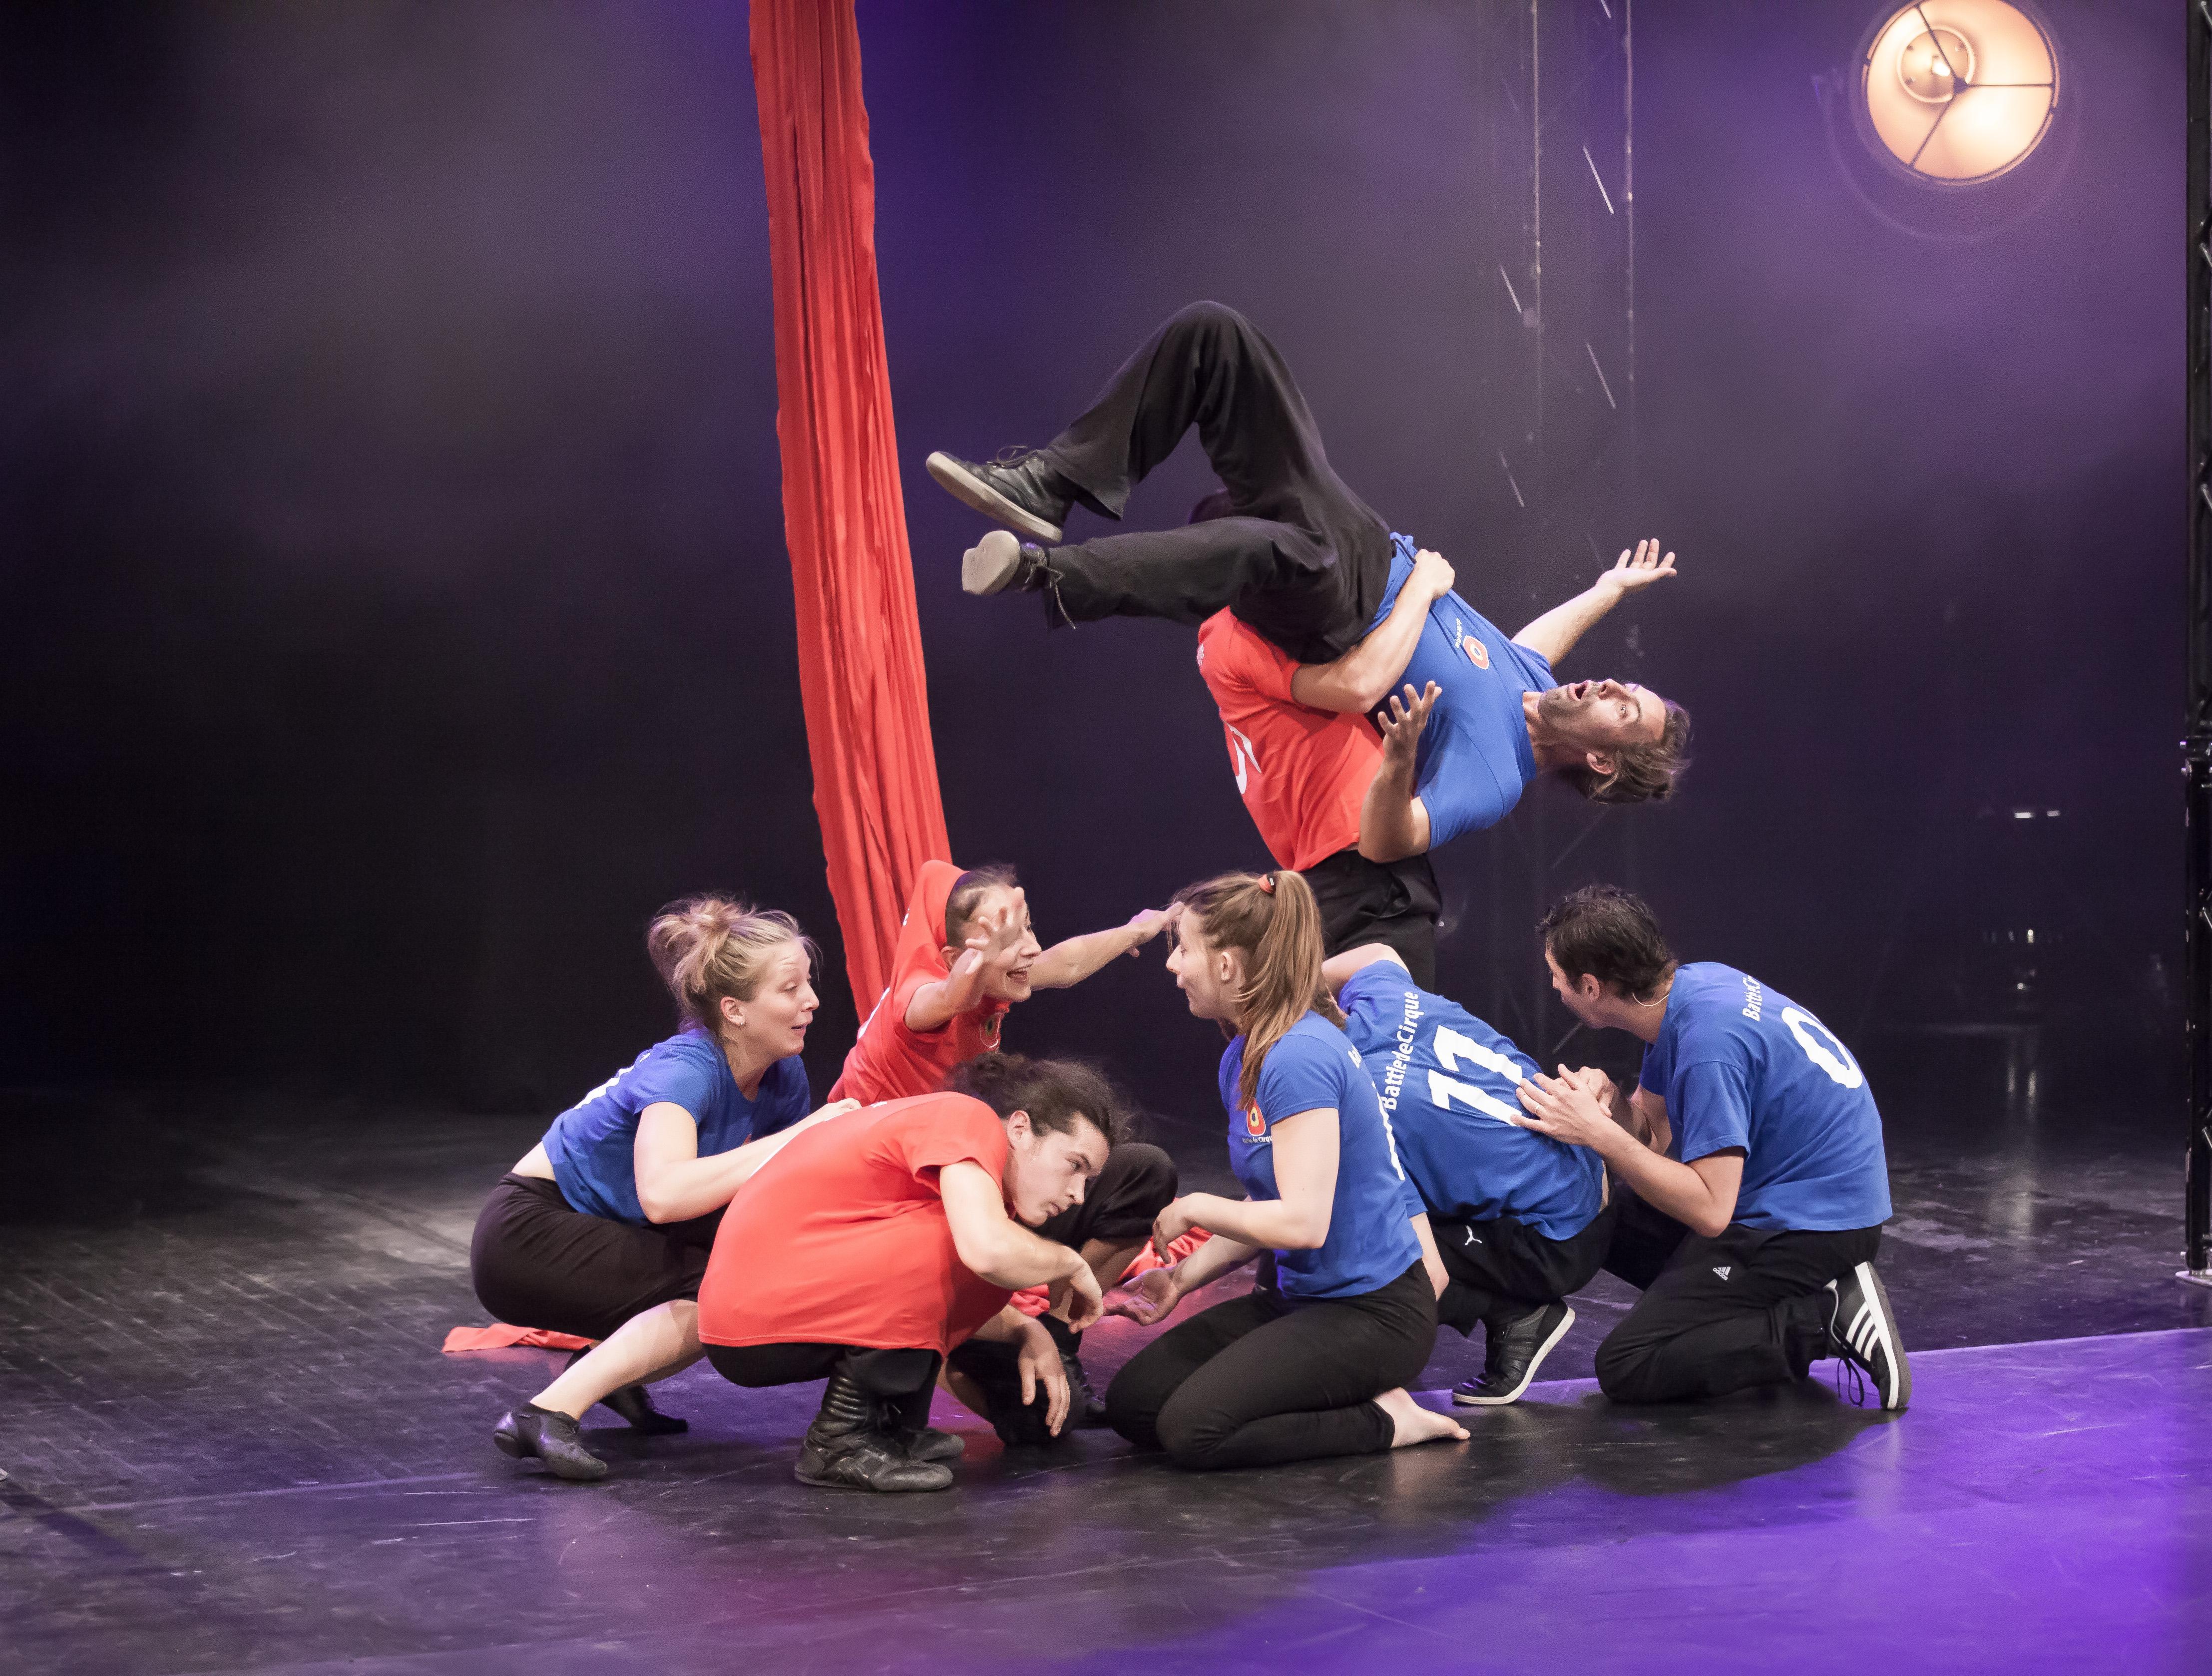 170701-battle-cirque-jdufresne-95_35664605432_o